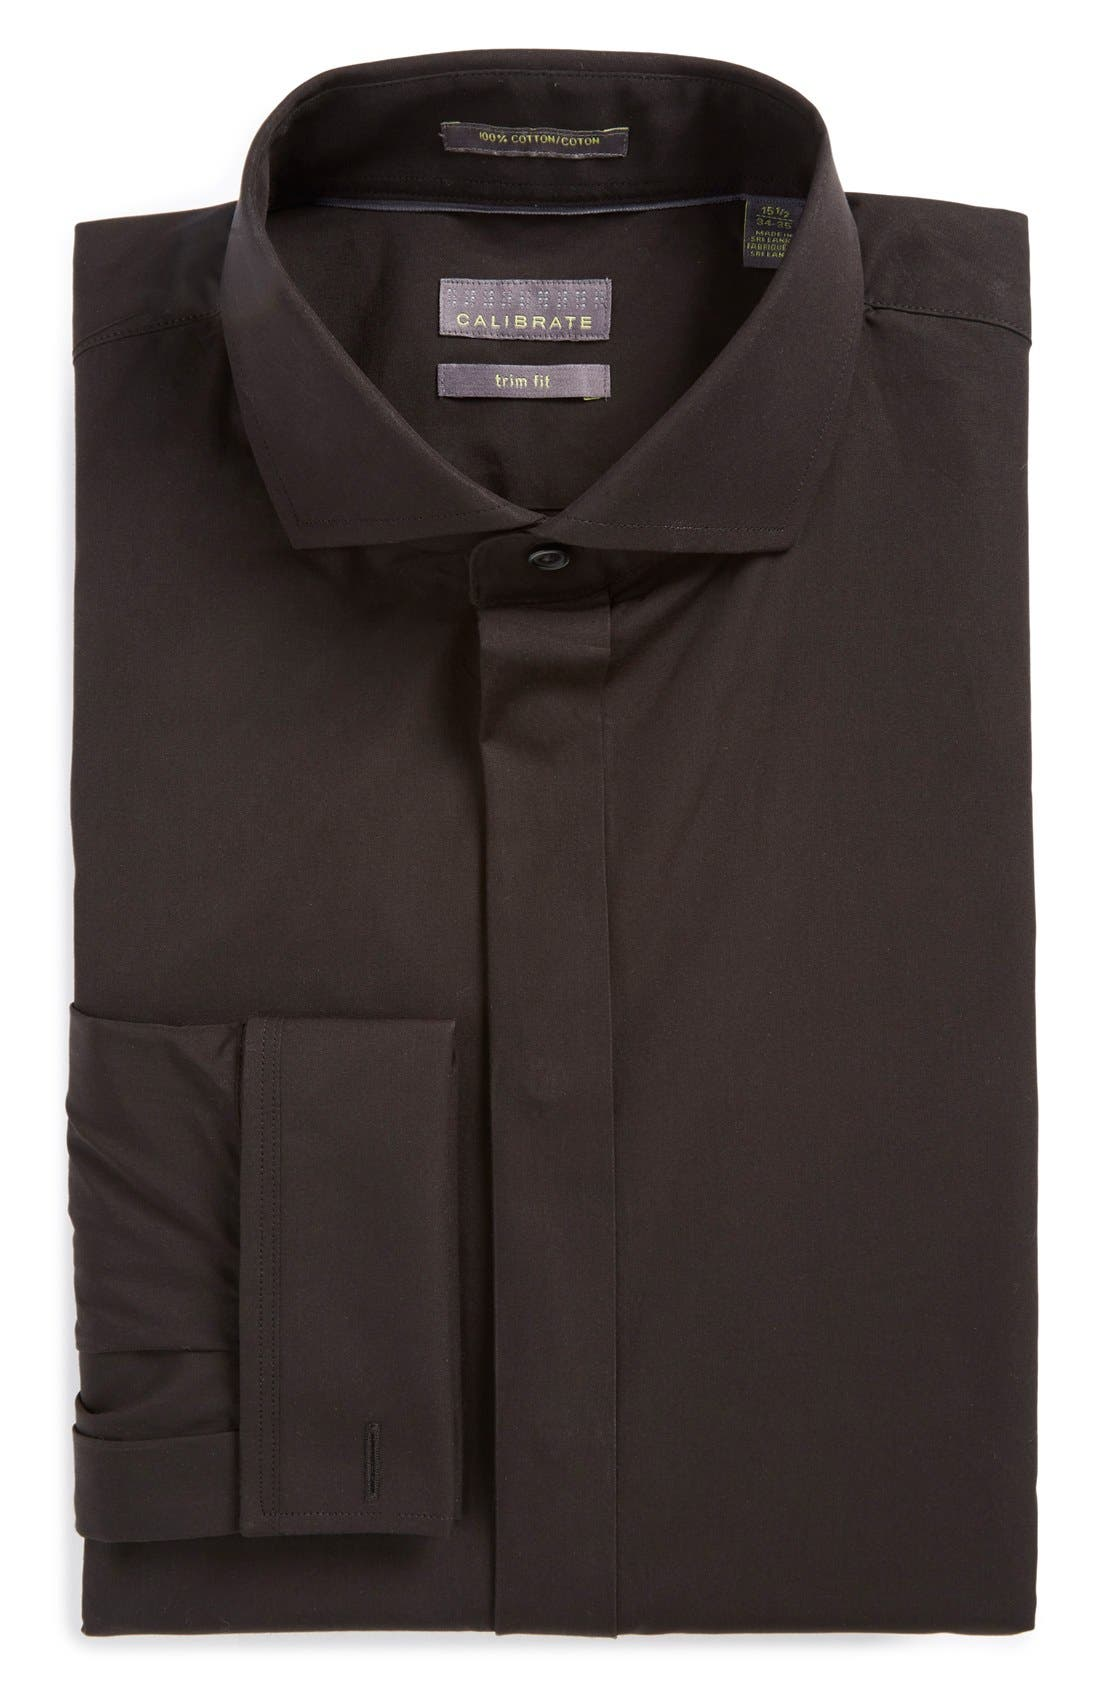 Calibrate Trim Fit Solid Tuxedo Shirt